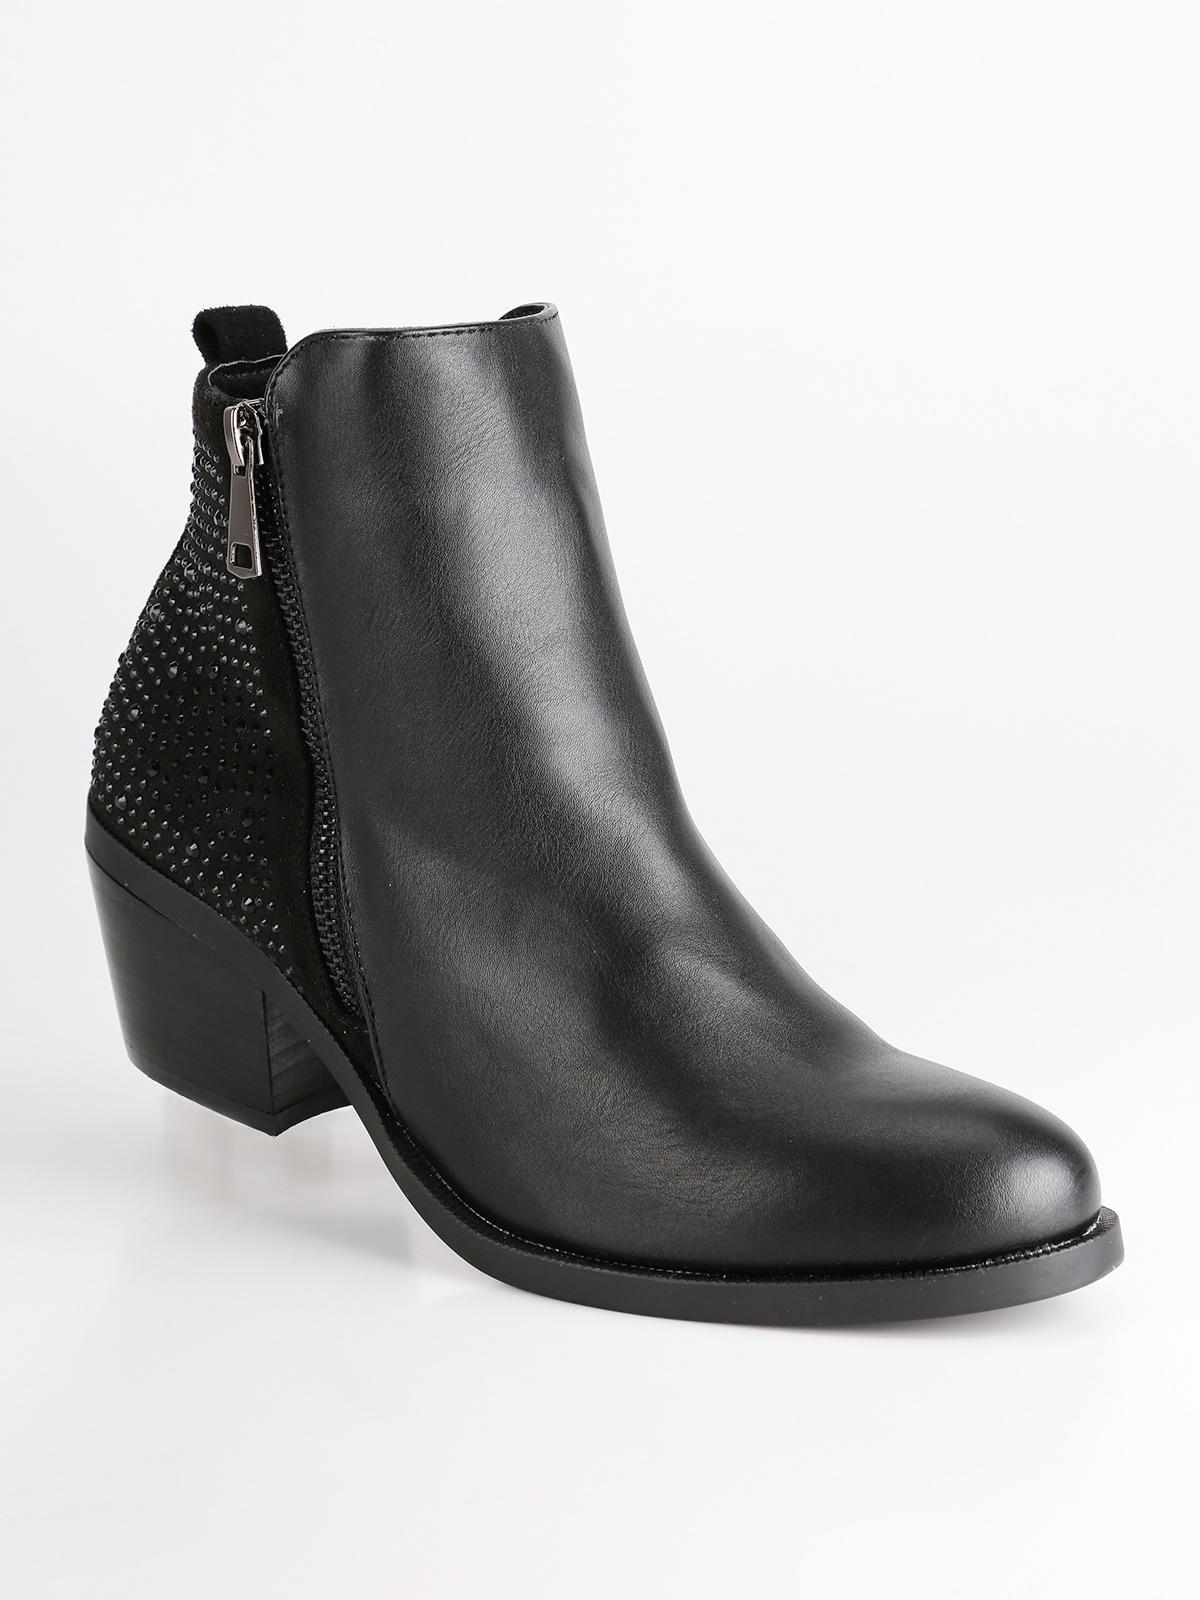 jeans, chelsea boots, top, shirt, shoes, clothes, jewels, t